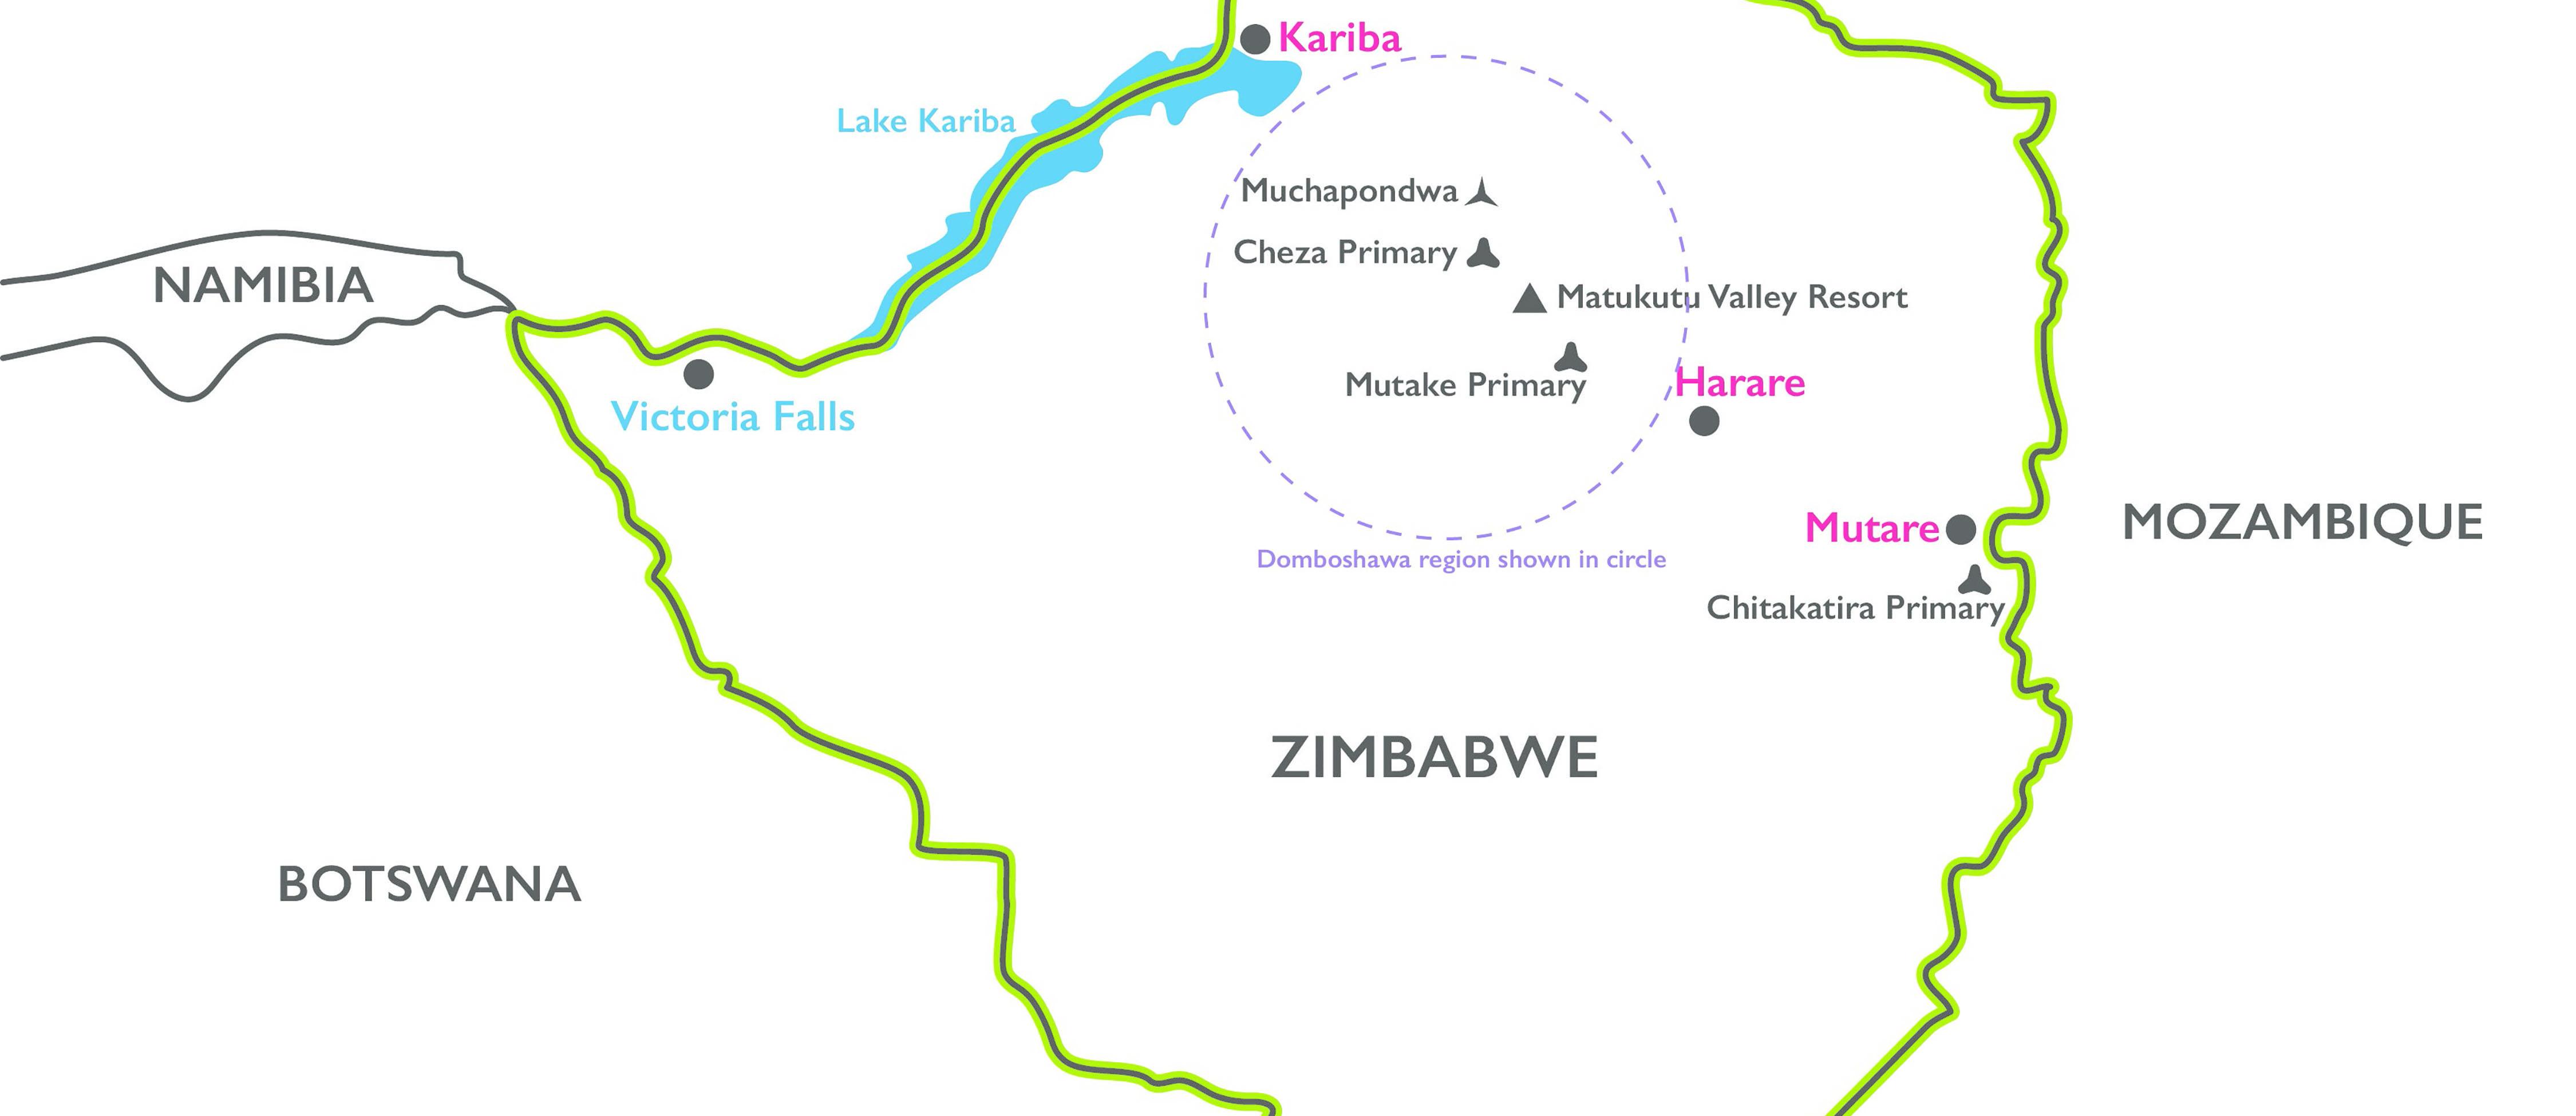 the relationship between shona and ndebele